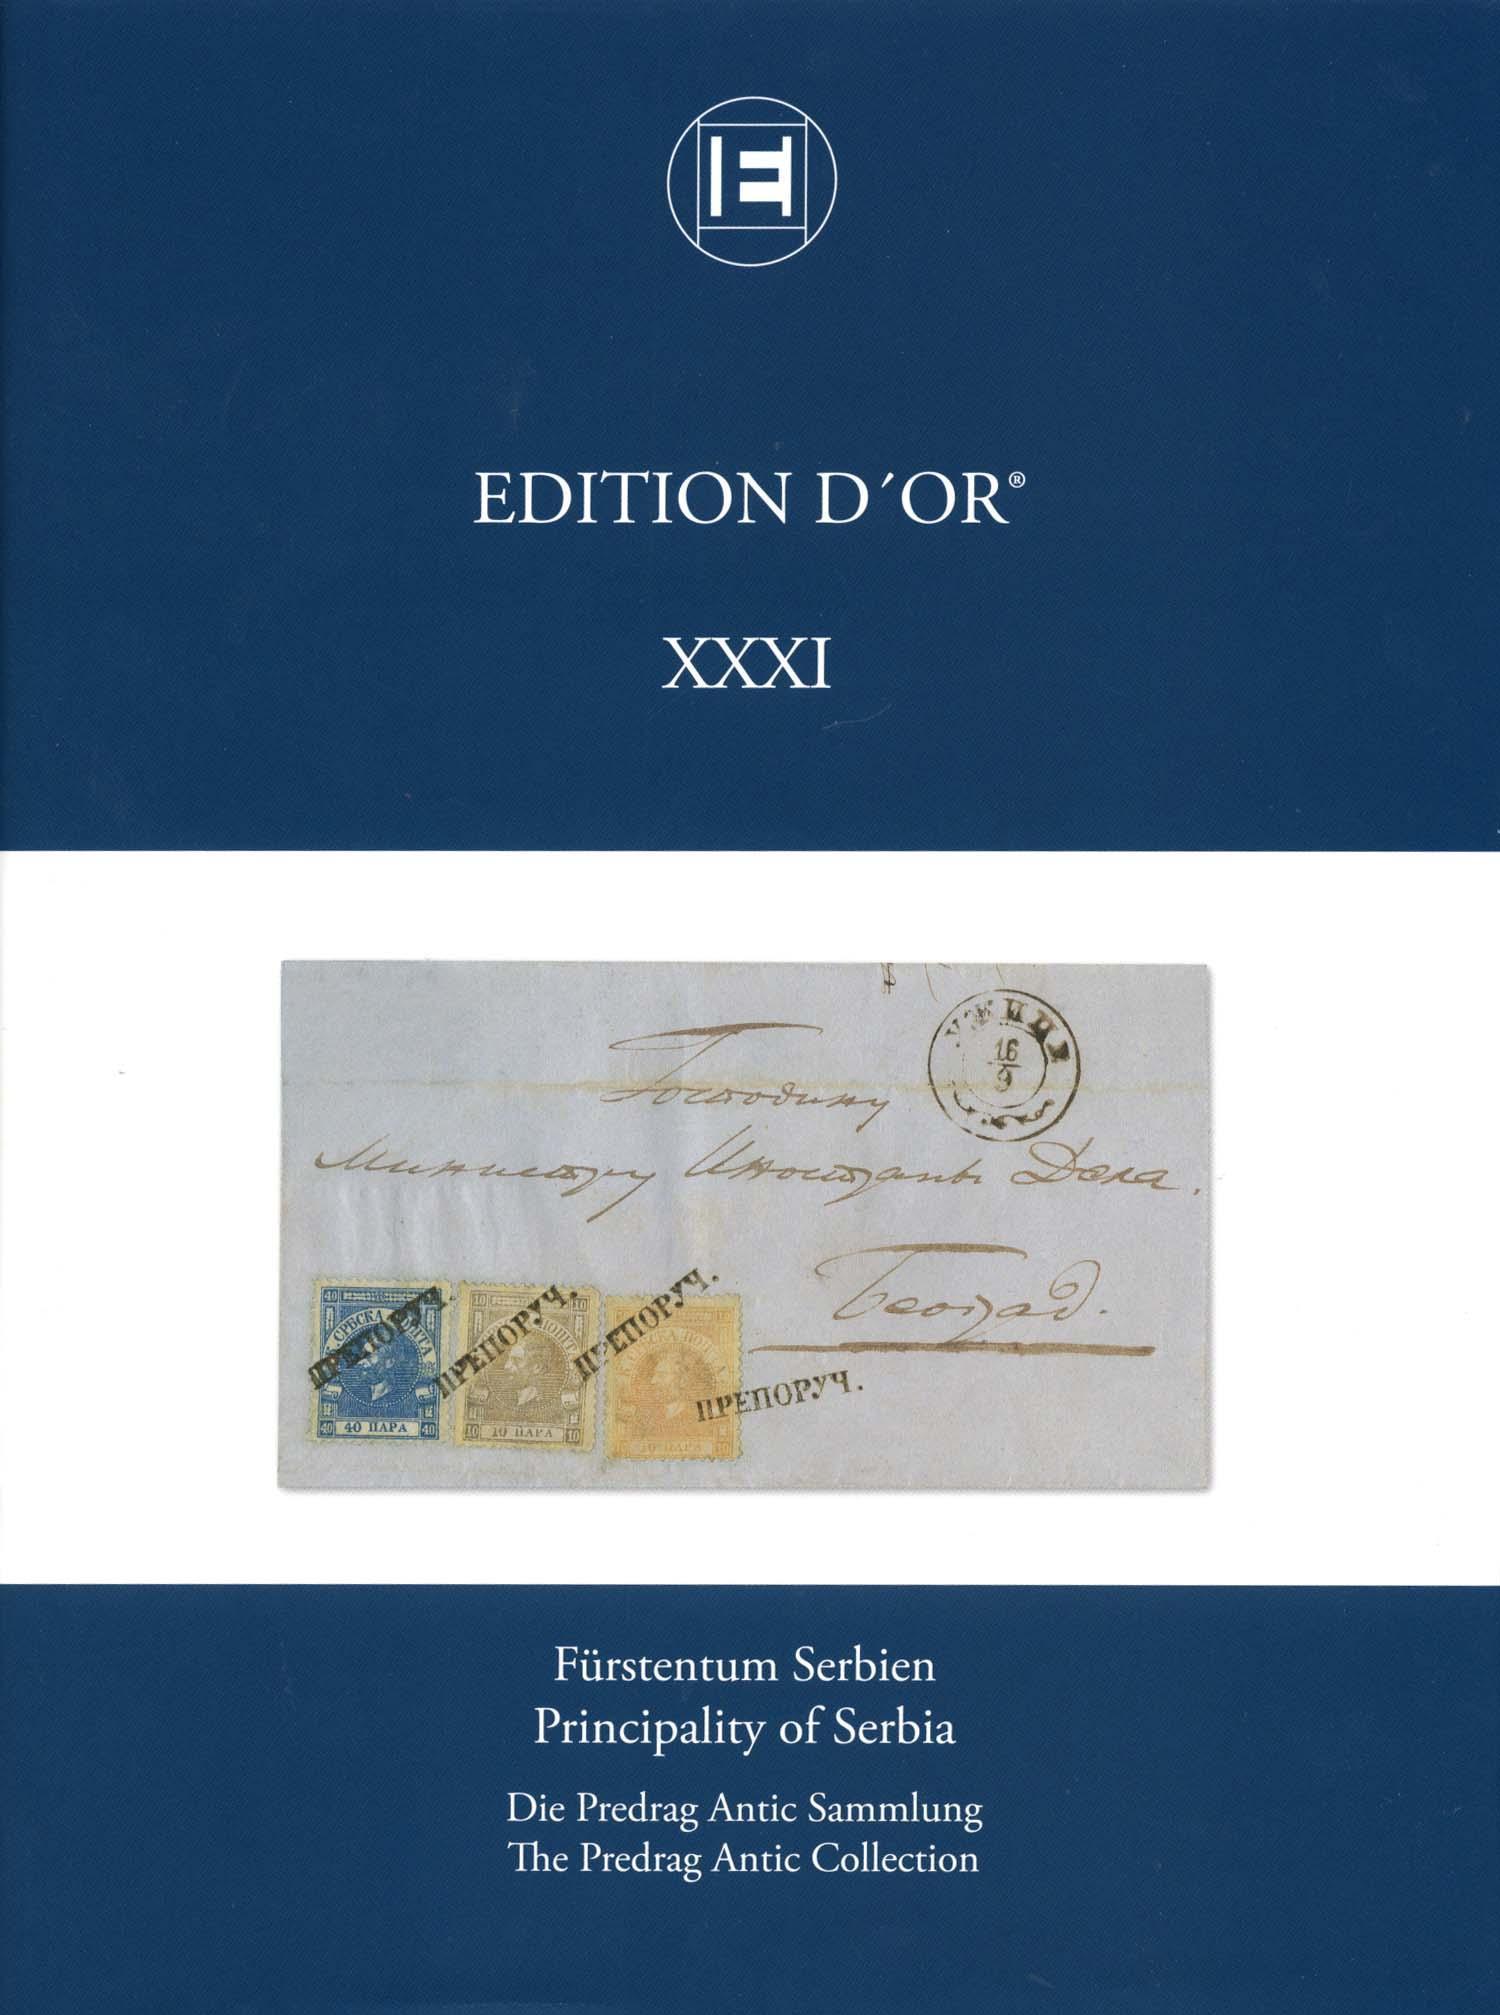 Vol. 31: Principality Serbia • The Predrag Antic Collection